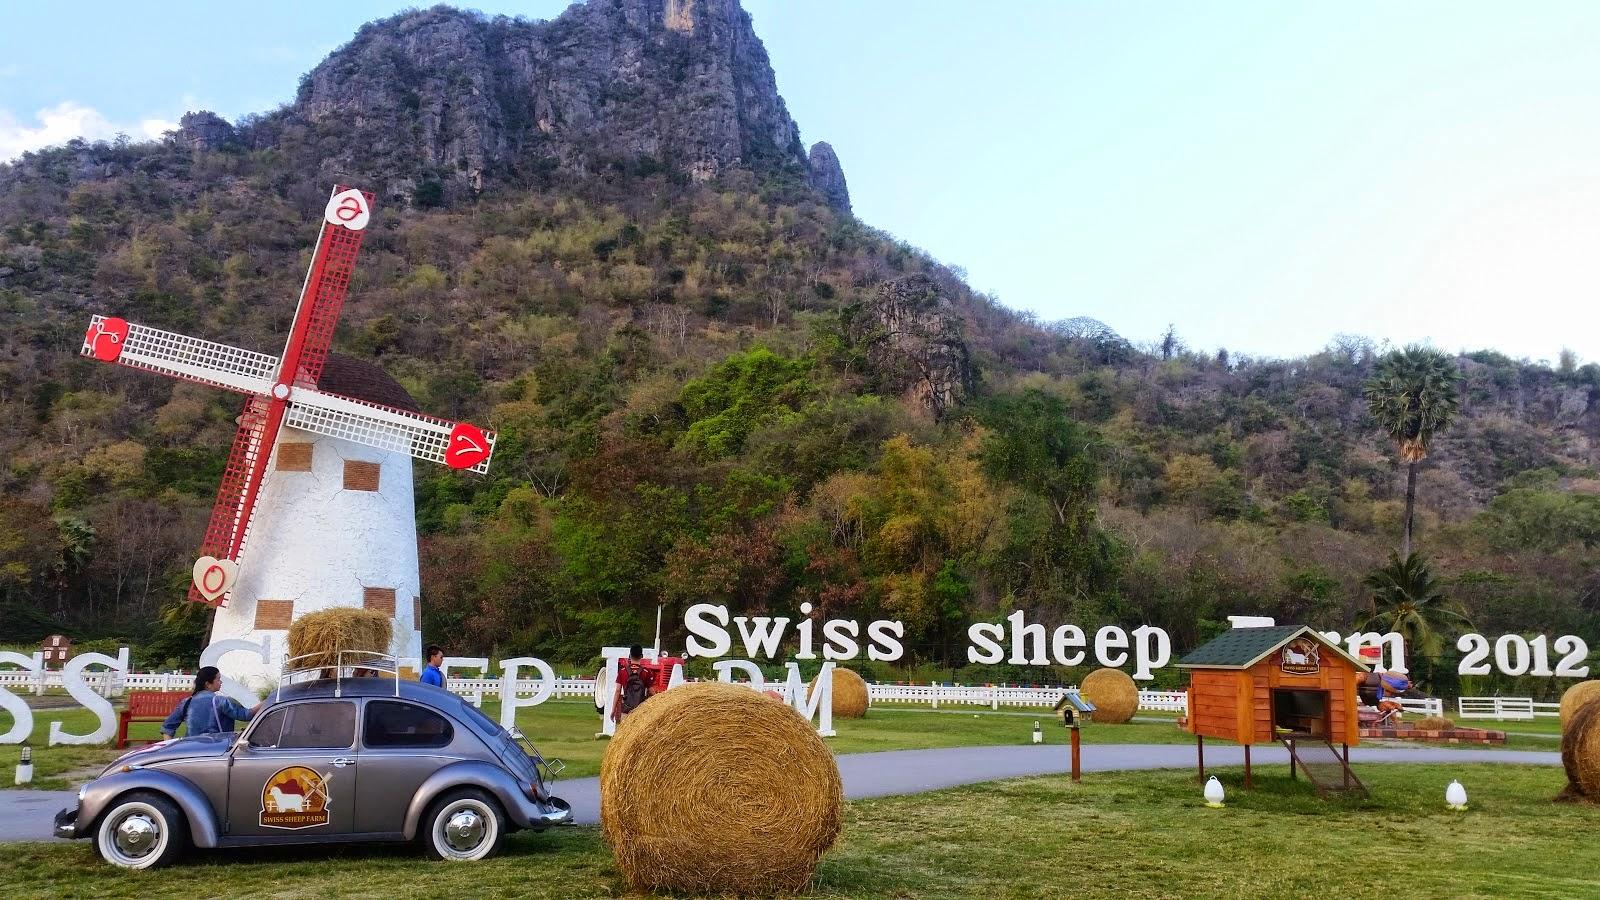 Swiss sheep ชะอำ